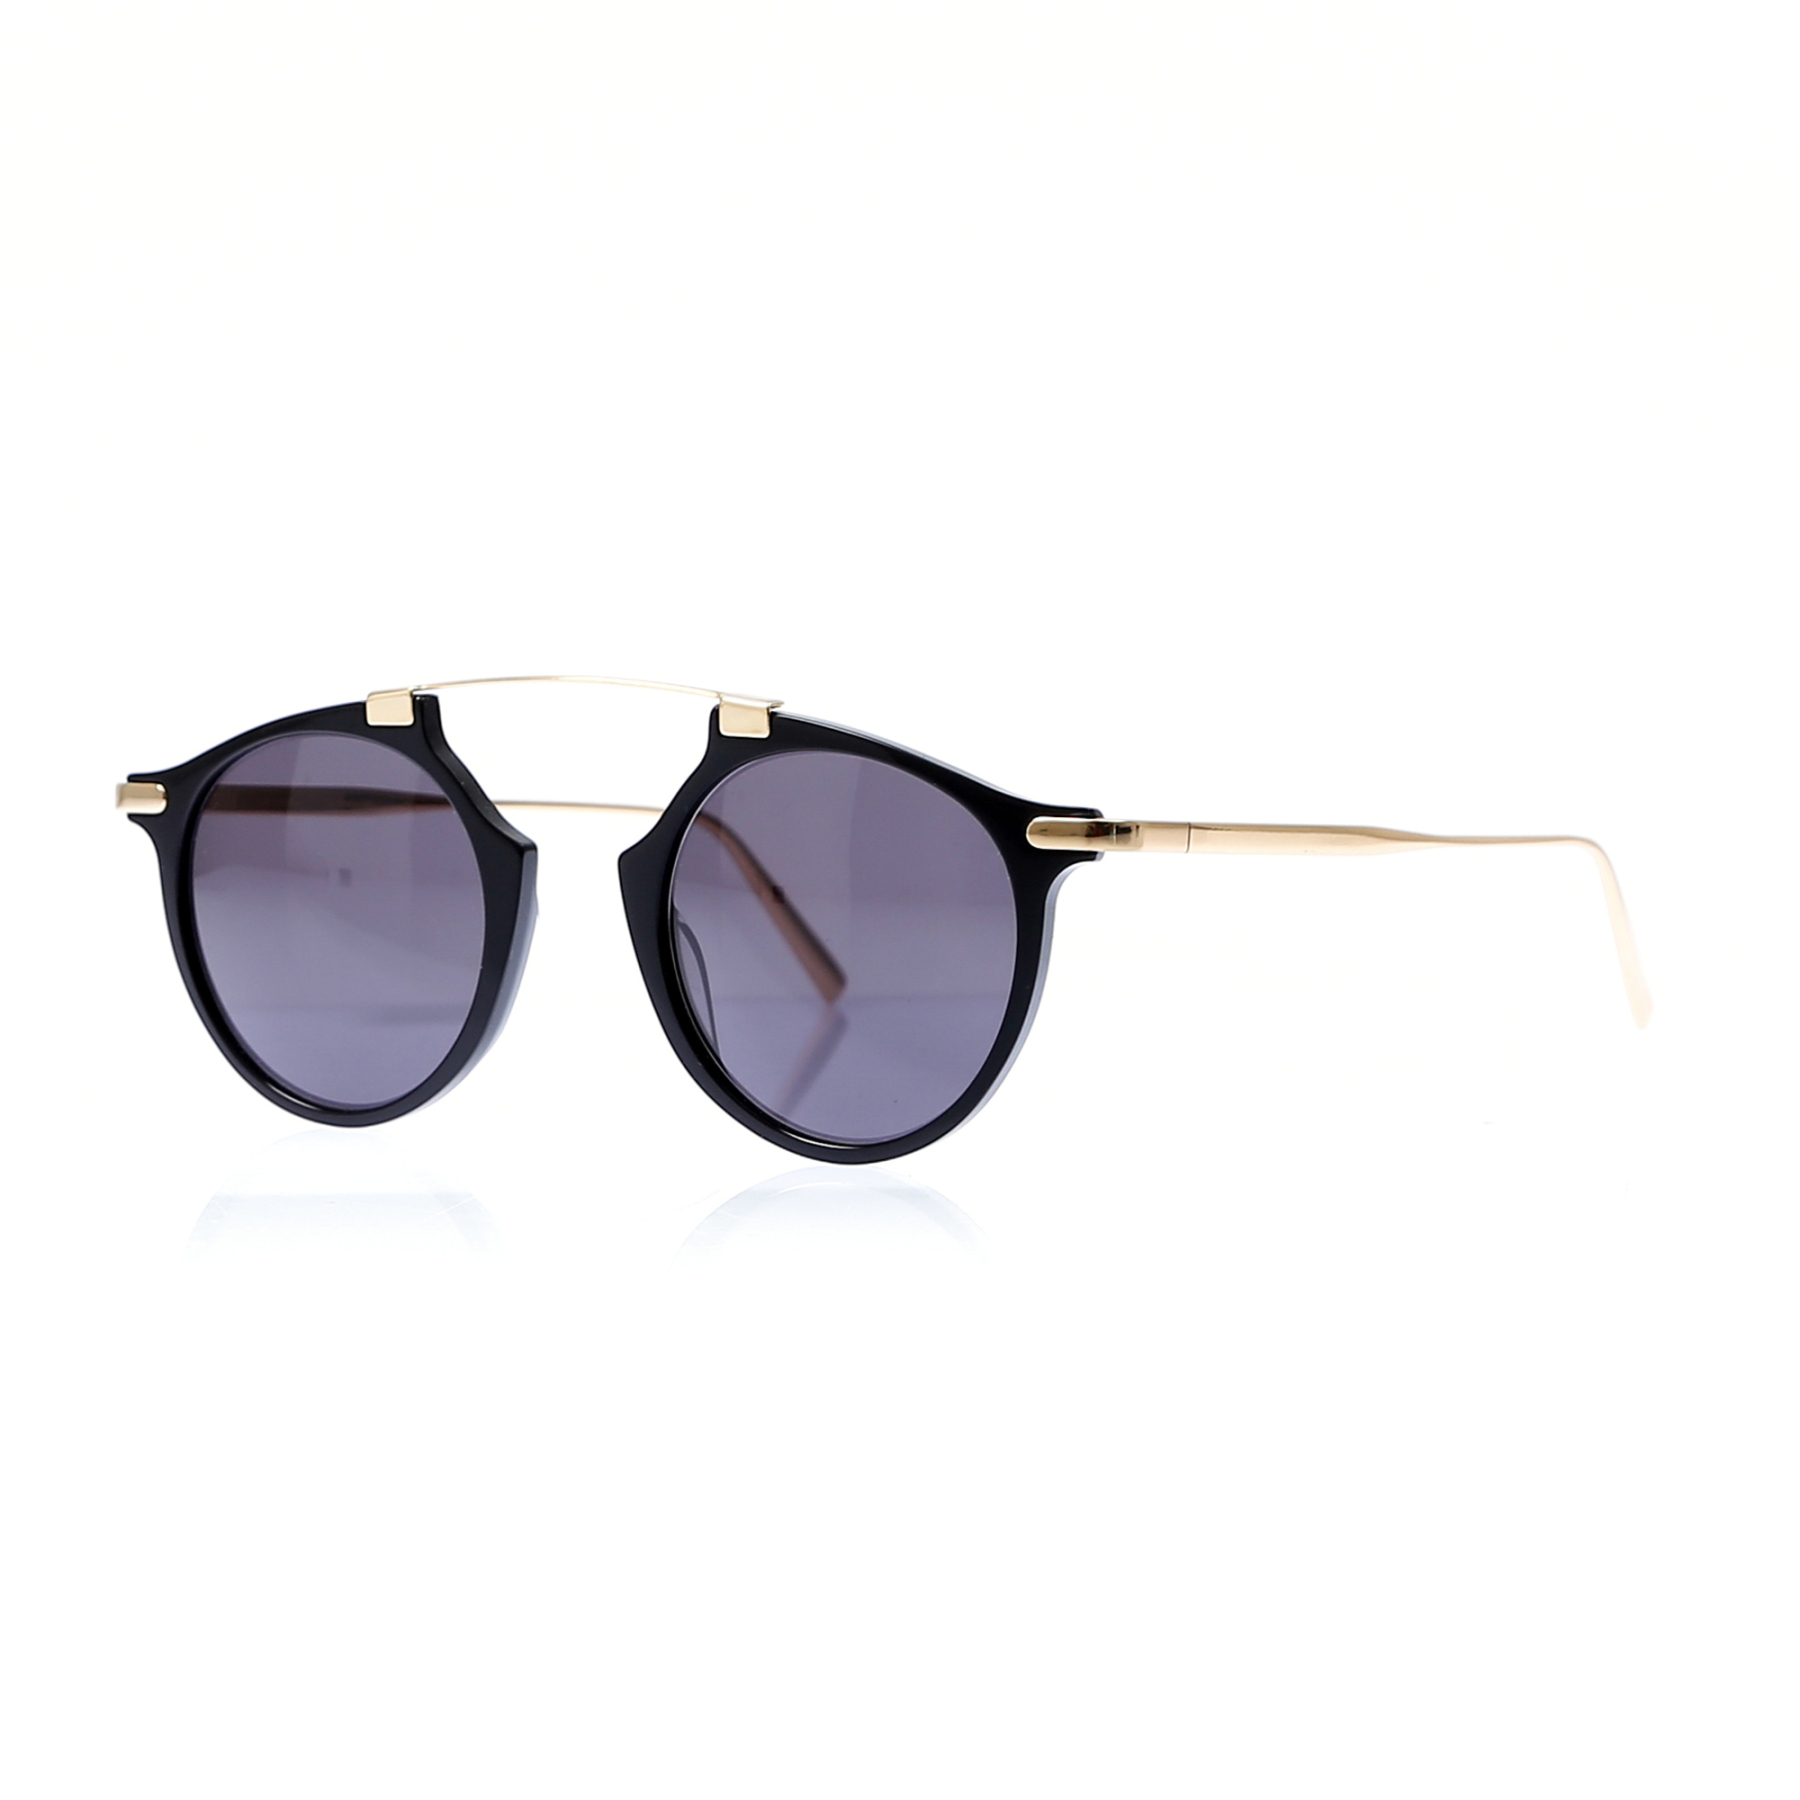 Unisex sunglasses msd 9009 b1 bone black organic 48 -- massada